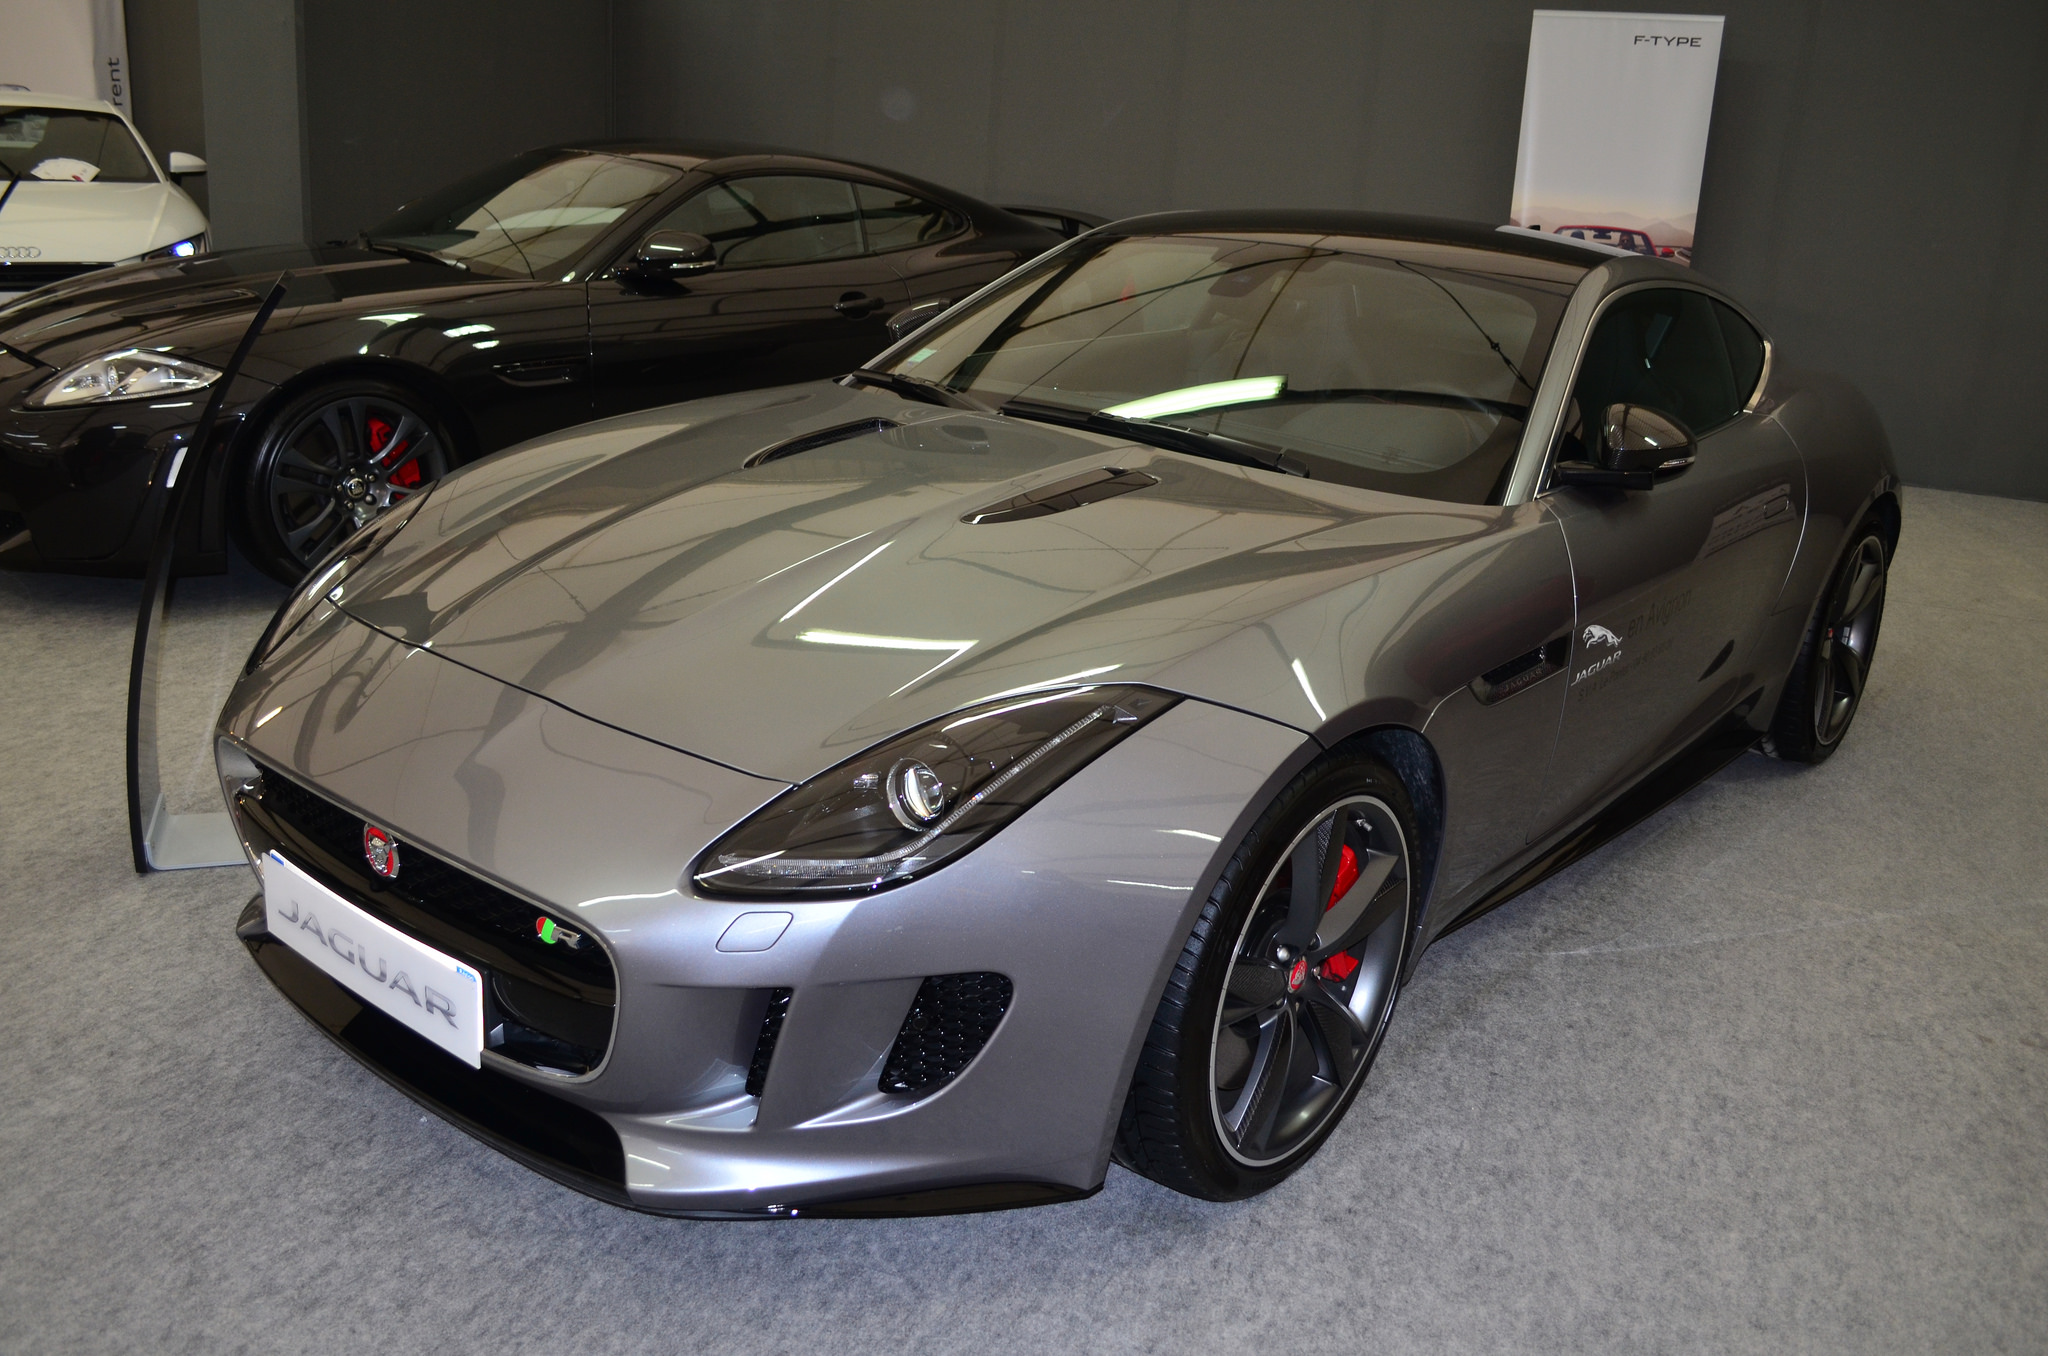 jaguarf-typercoupe.jpg